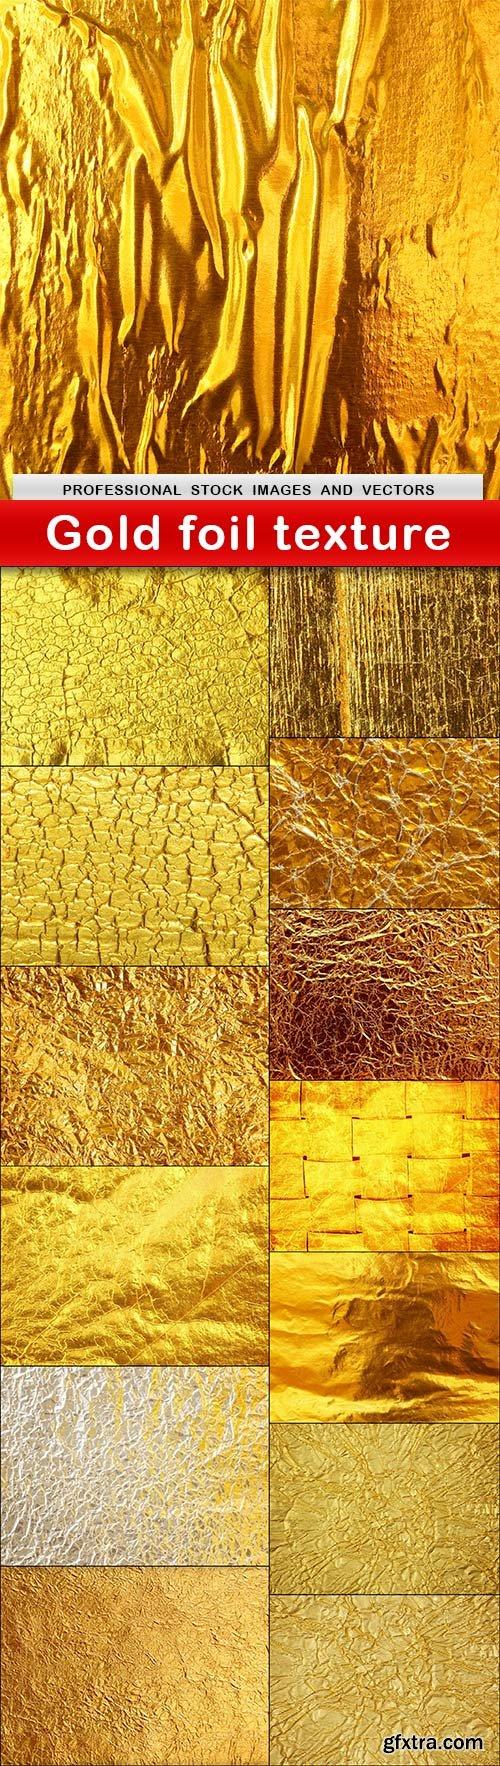 Gold foil texture - 14 UHQ JPEG